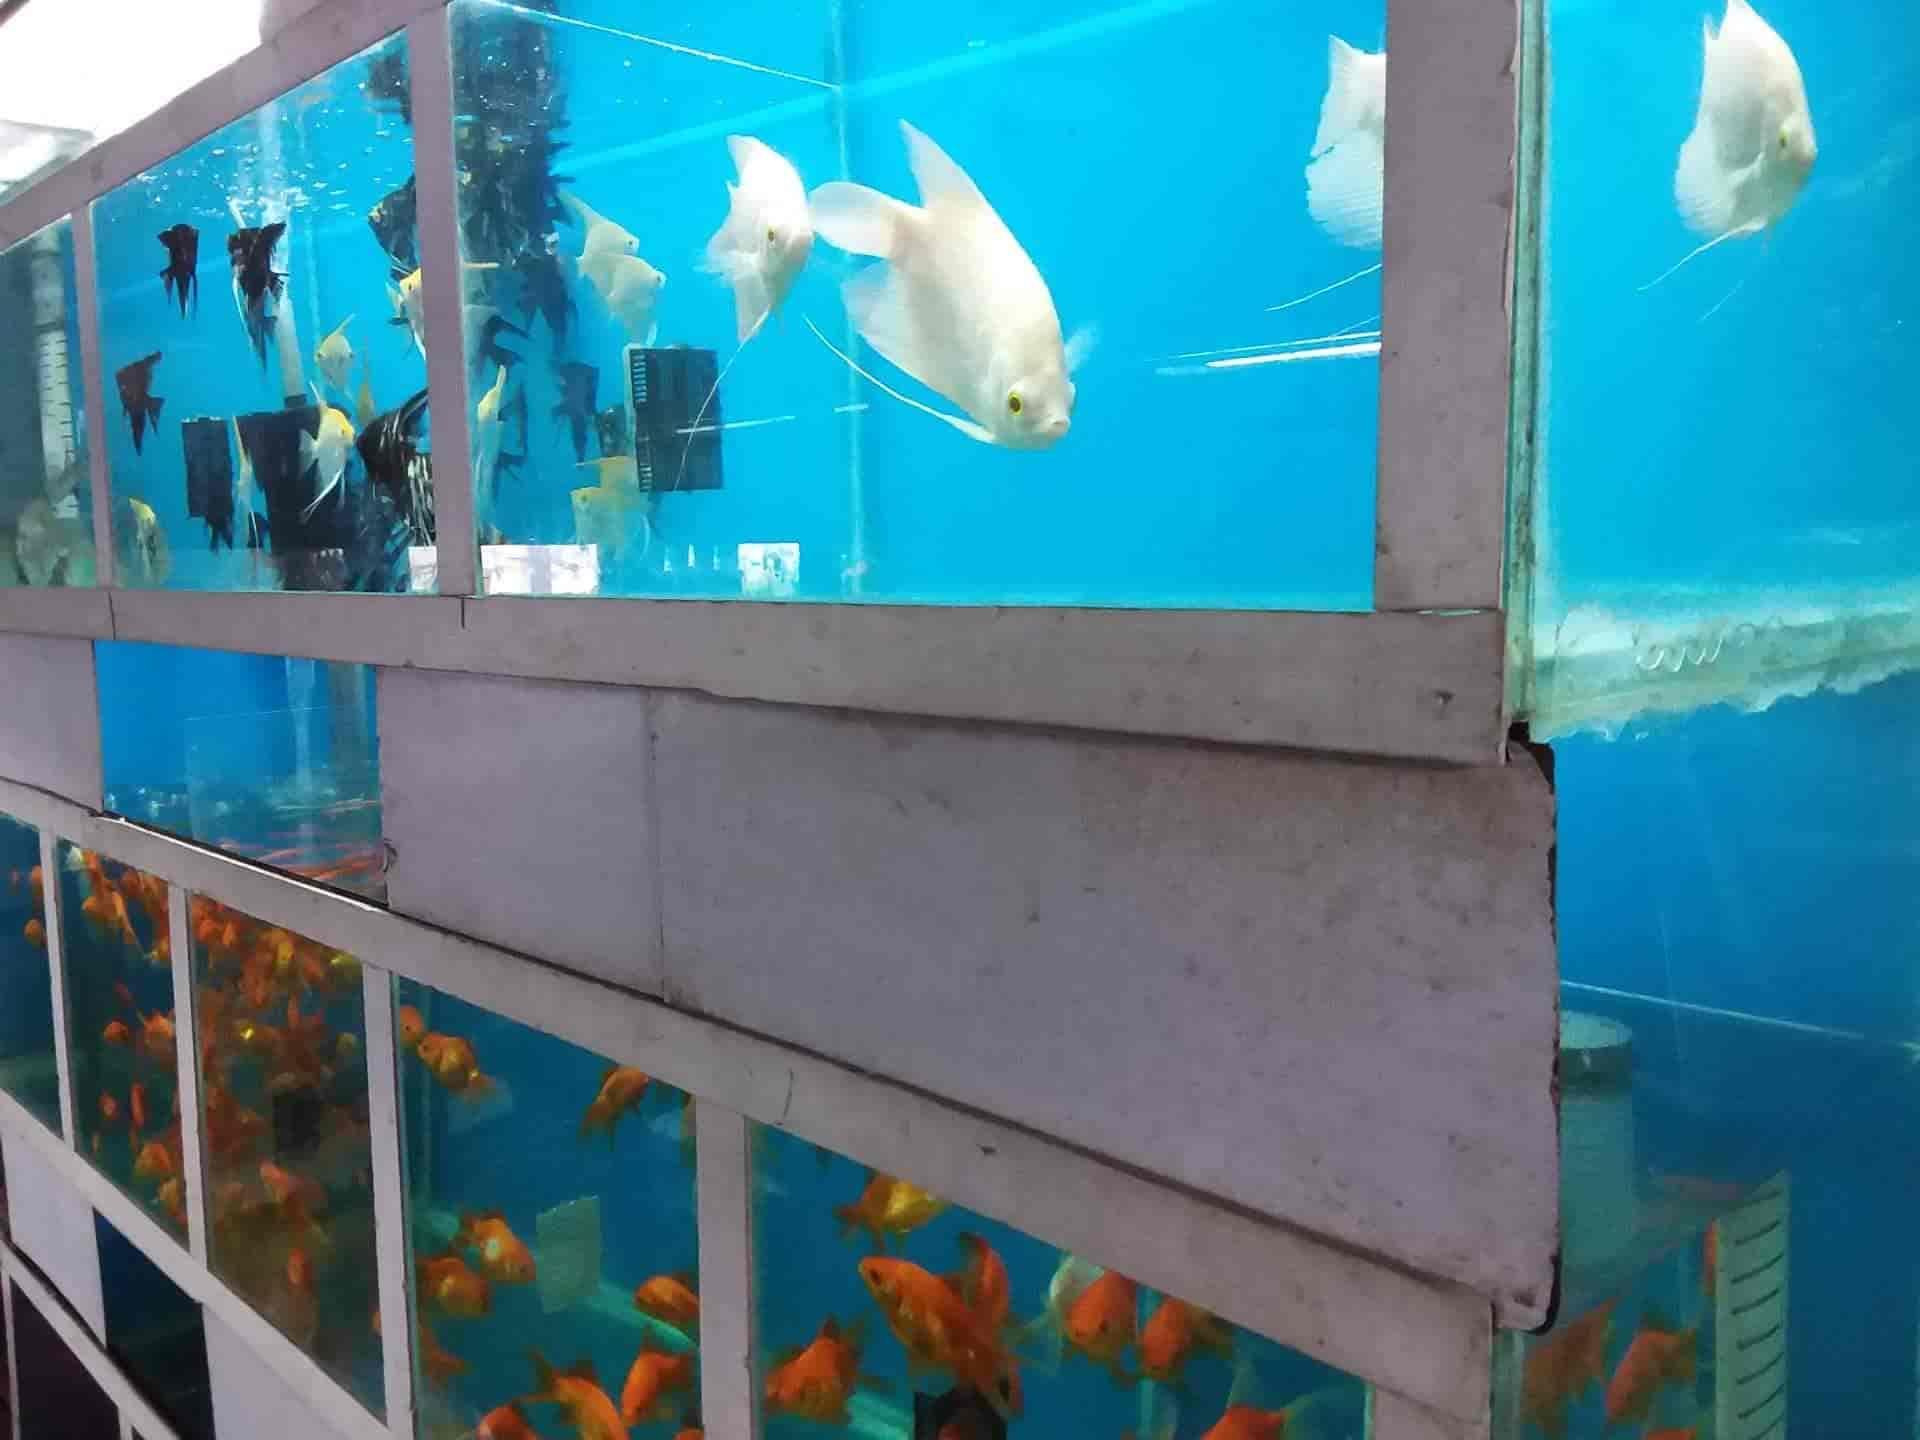 Top Fish Aquarium Dealers In Irinjalakuda Best Fish Aquarium Shops Justdial